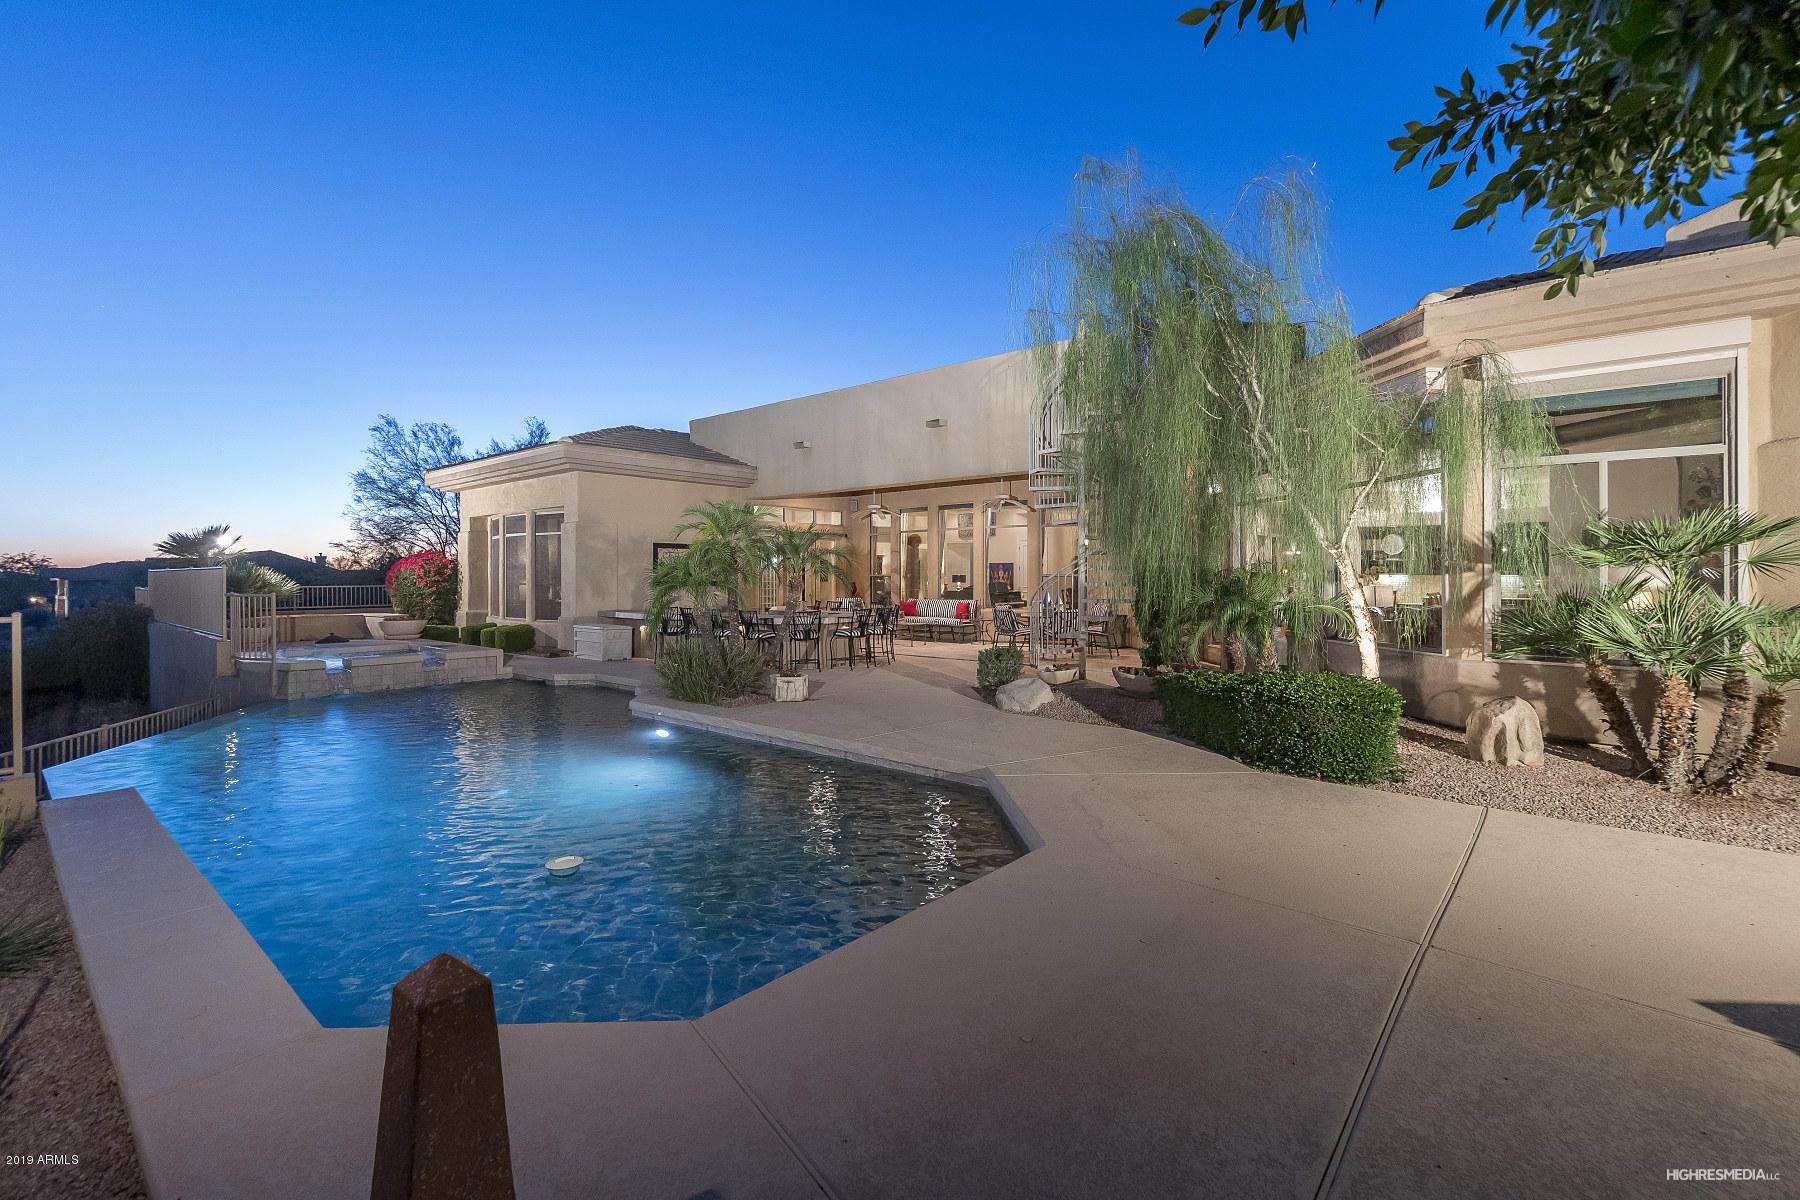 MLS 5949931 12199 E MARY KATHERINE Drive, Scottsdale, AZ 85259 Scottsdale AZ Private Pool